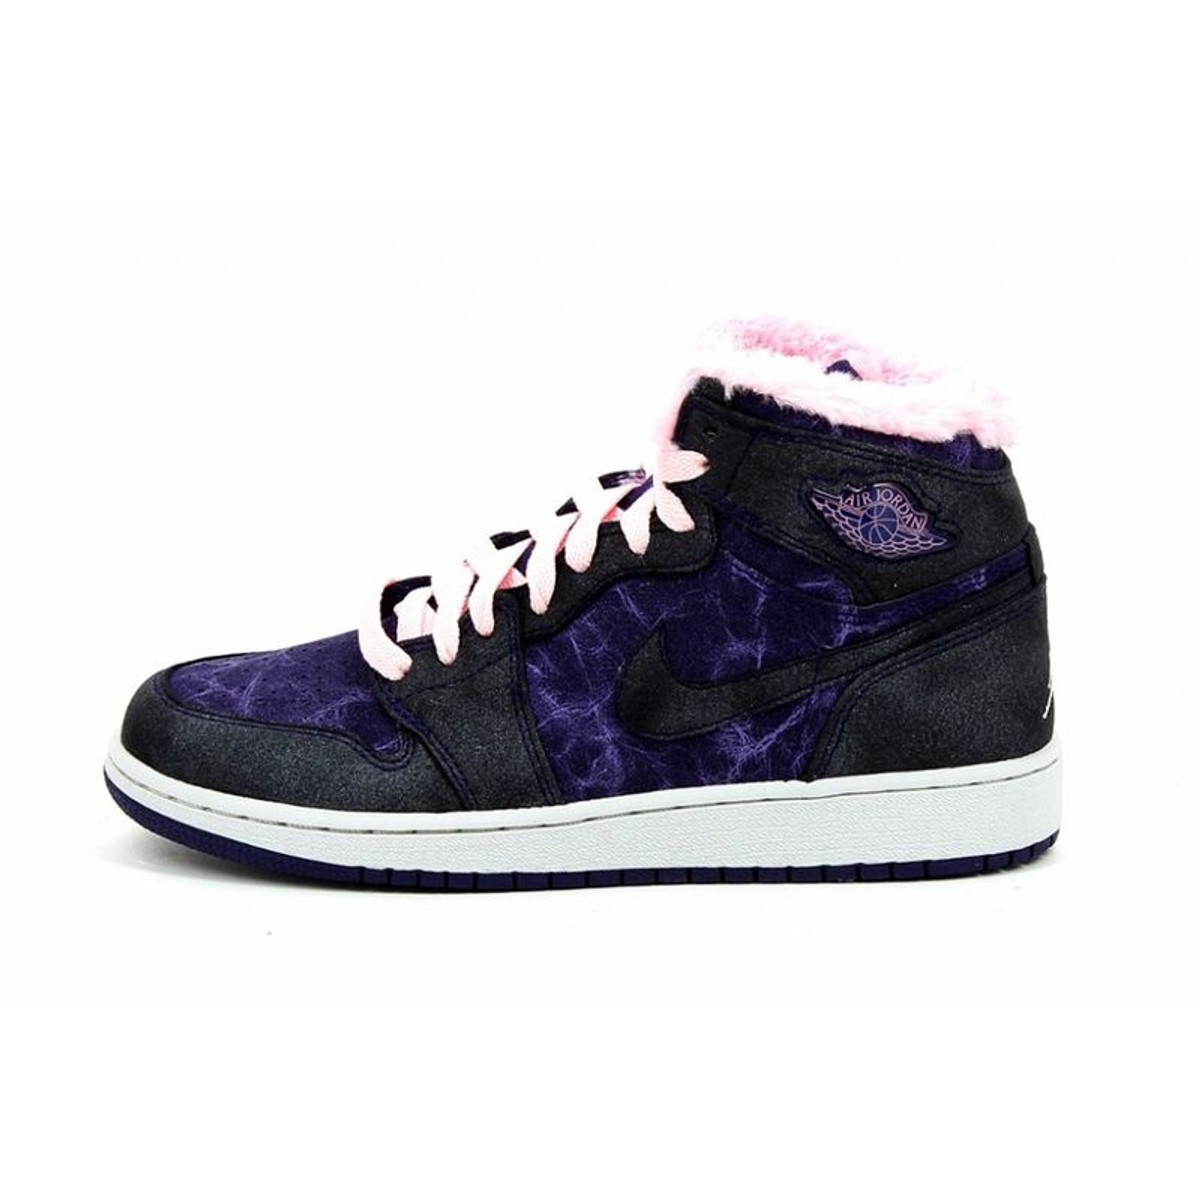 meilleur site web bfd5f 5617a Basket Nike Air Jordan 1 Retro (gs) - 535804-509 - Taille ...